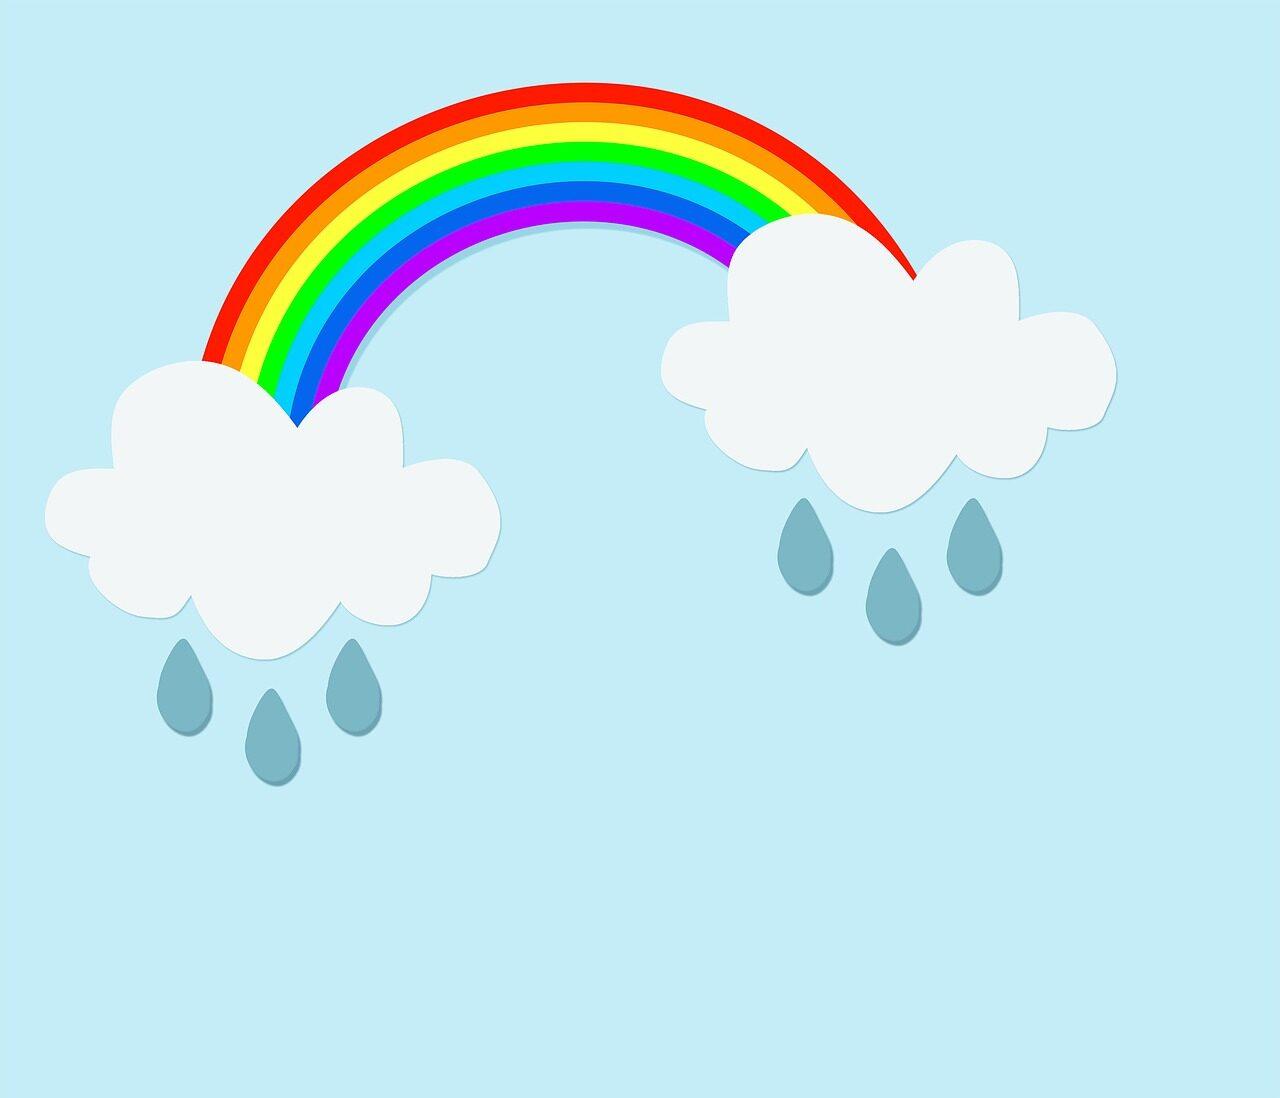 rainbow-3426111_1280.jpg